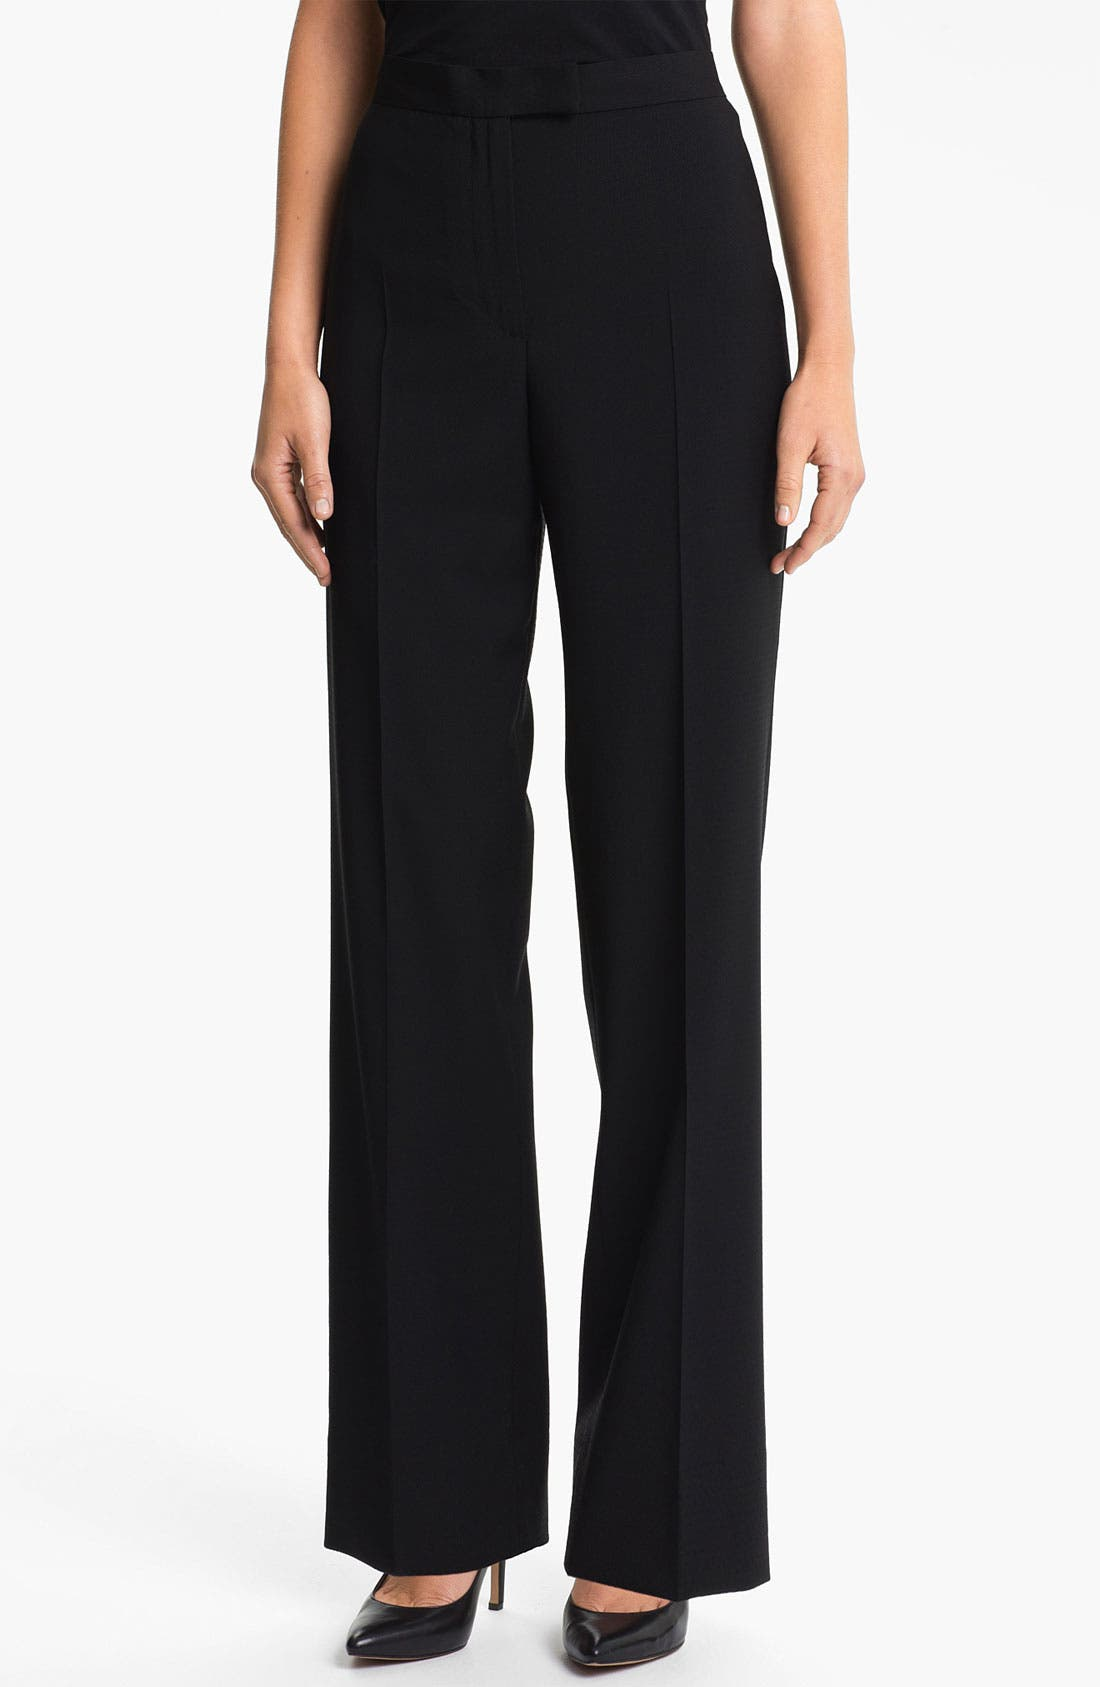 Alternate Image 1 Selected - Zanella 'Debra' Pants